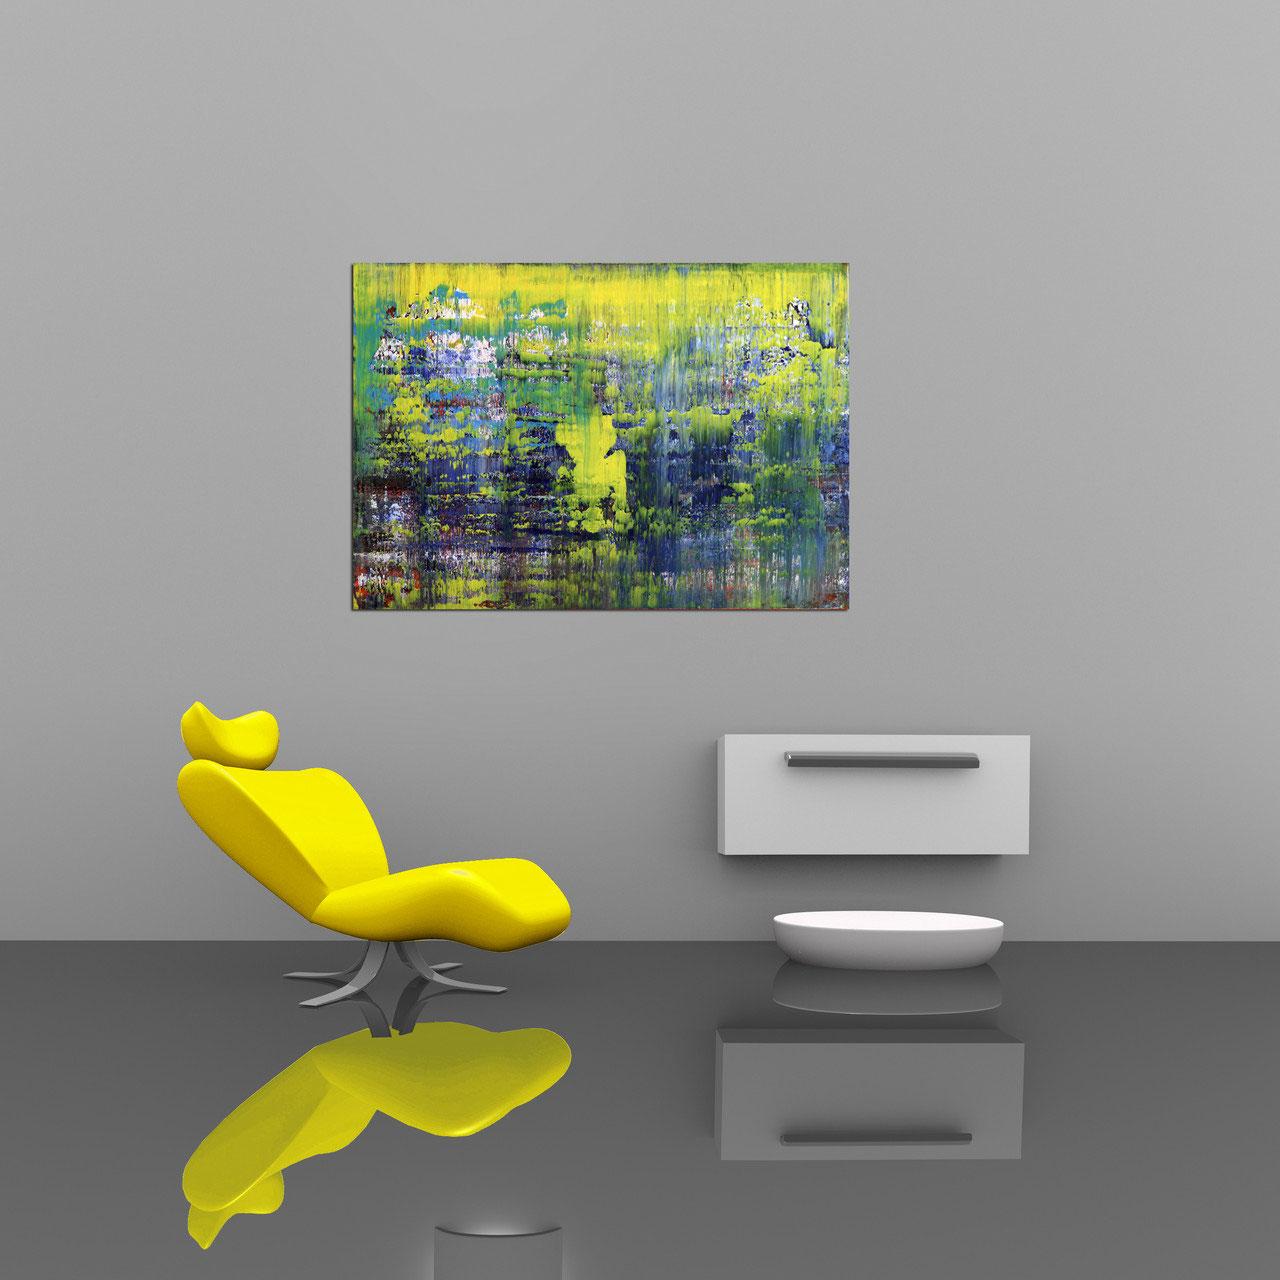 abstrakte bilder beton accessoires robert hundsdorfer. Black Bedroom Furniture Sets. Home Design Ideas